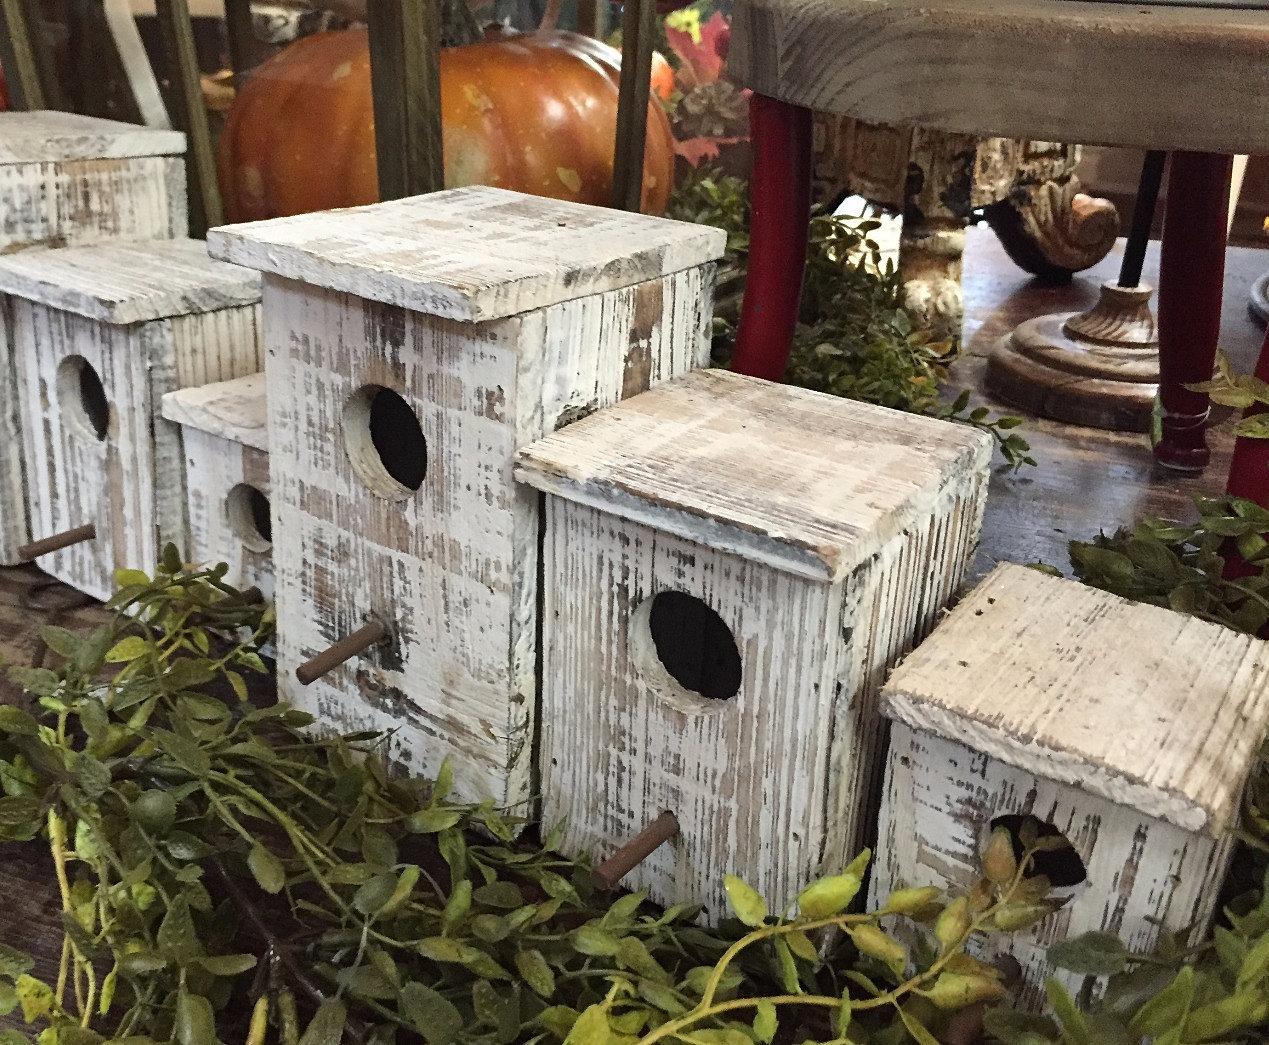 Rustic Birdhouses Petals Potpourri Home Rustic Birdhouses